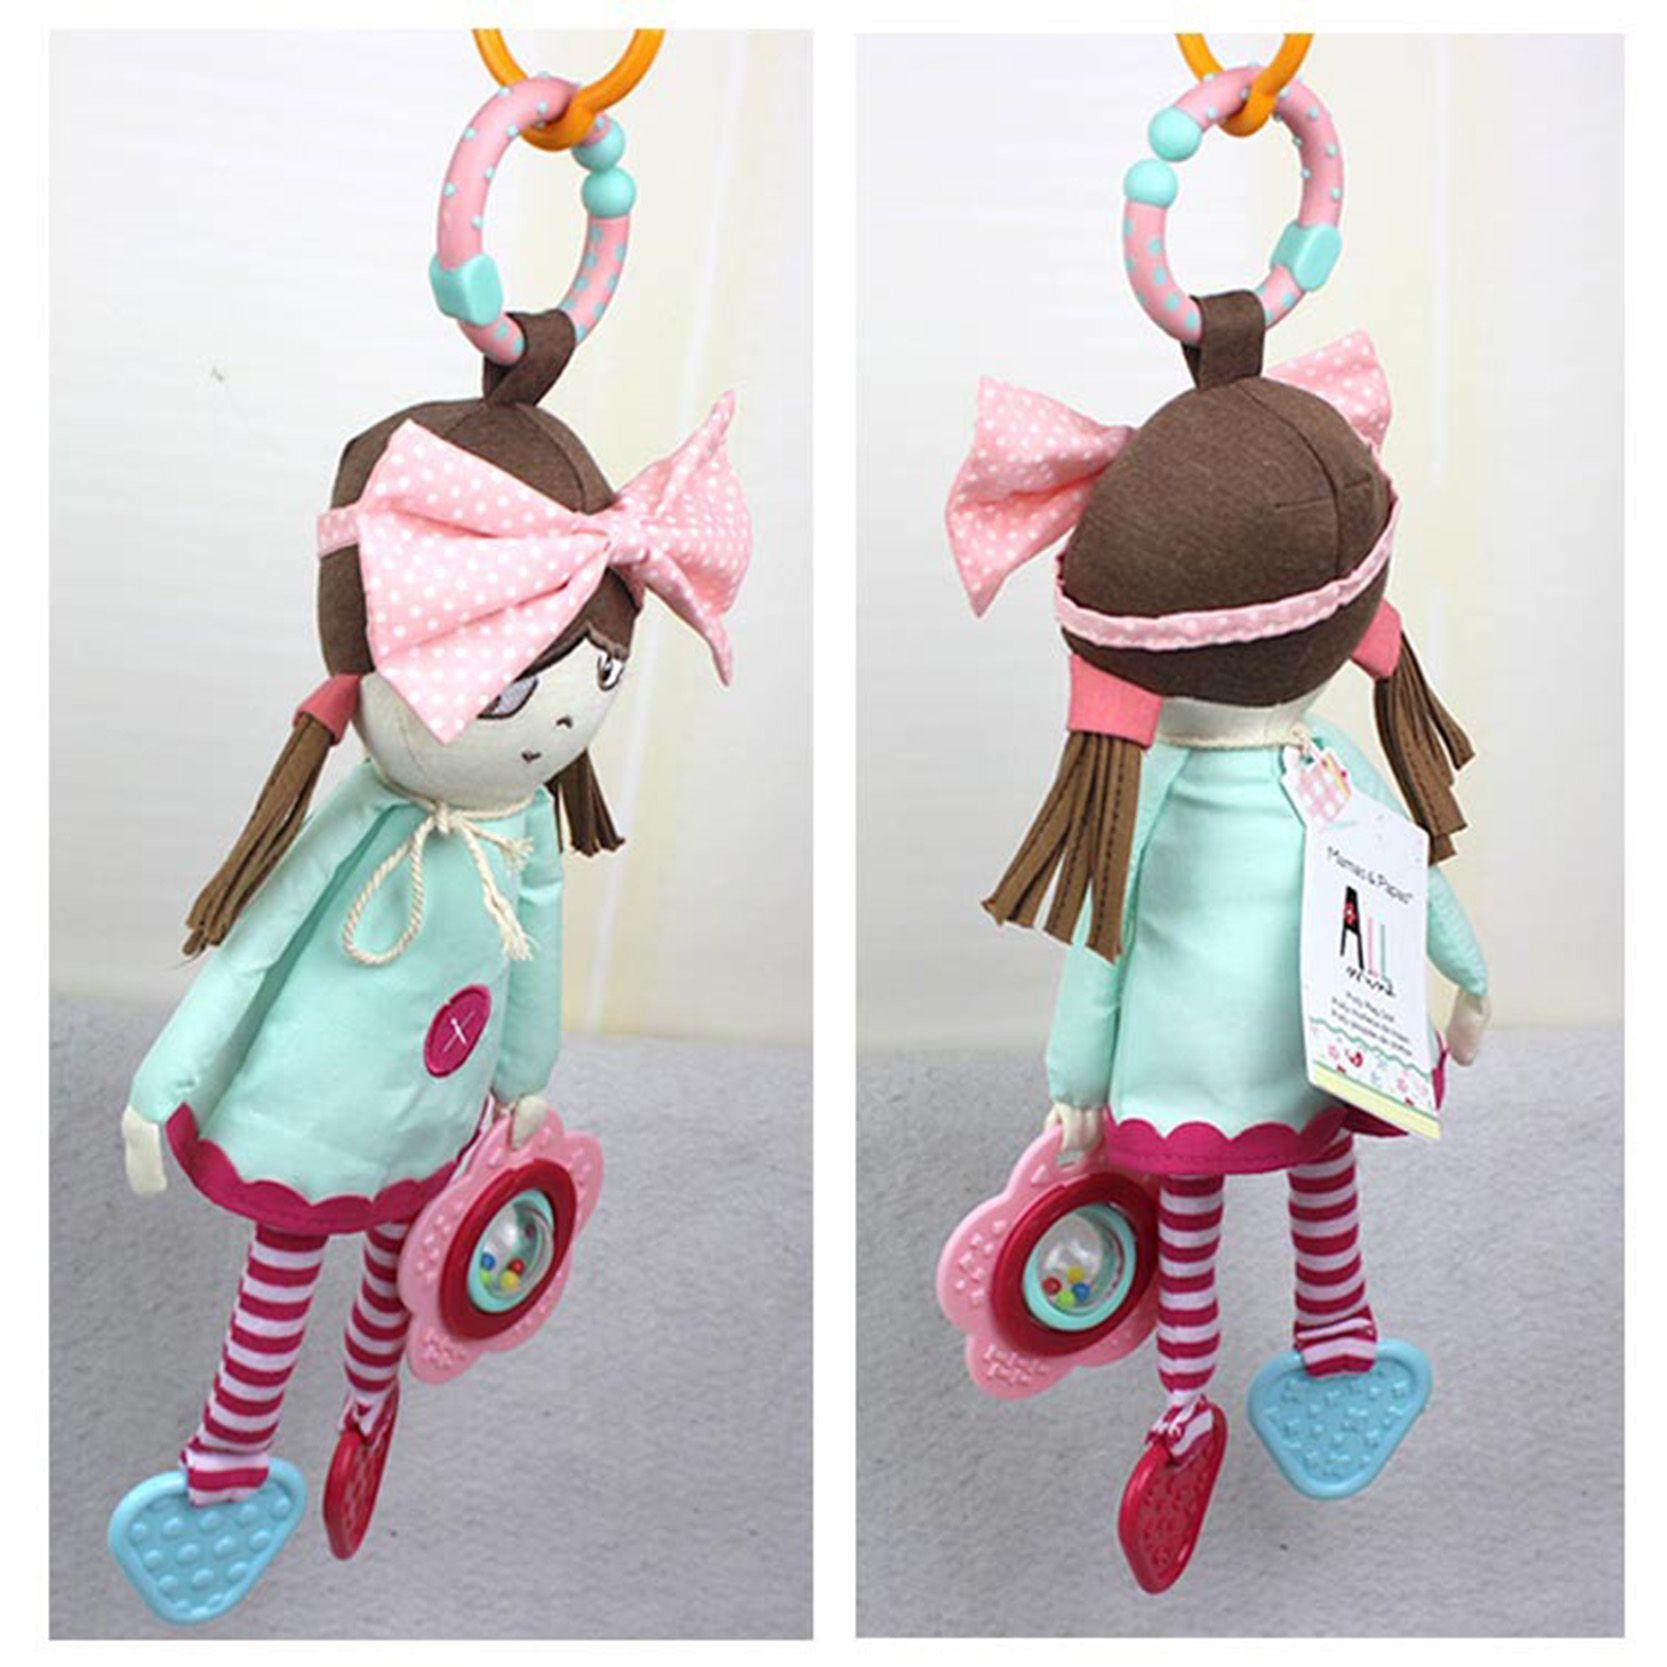 Baby Speelgoed Developmental Zuigeling Mobiele In de Crib Musical Rammelaar Babyrammelaars Pop Knuffel Opknoping In De Kinderwagen